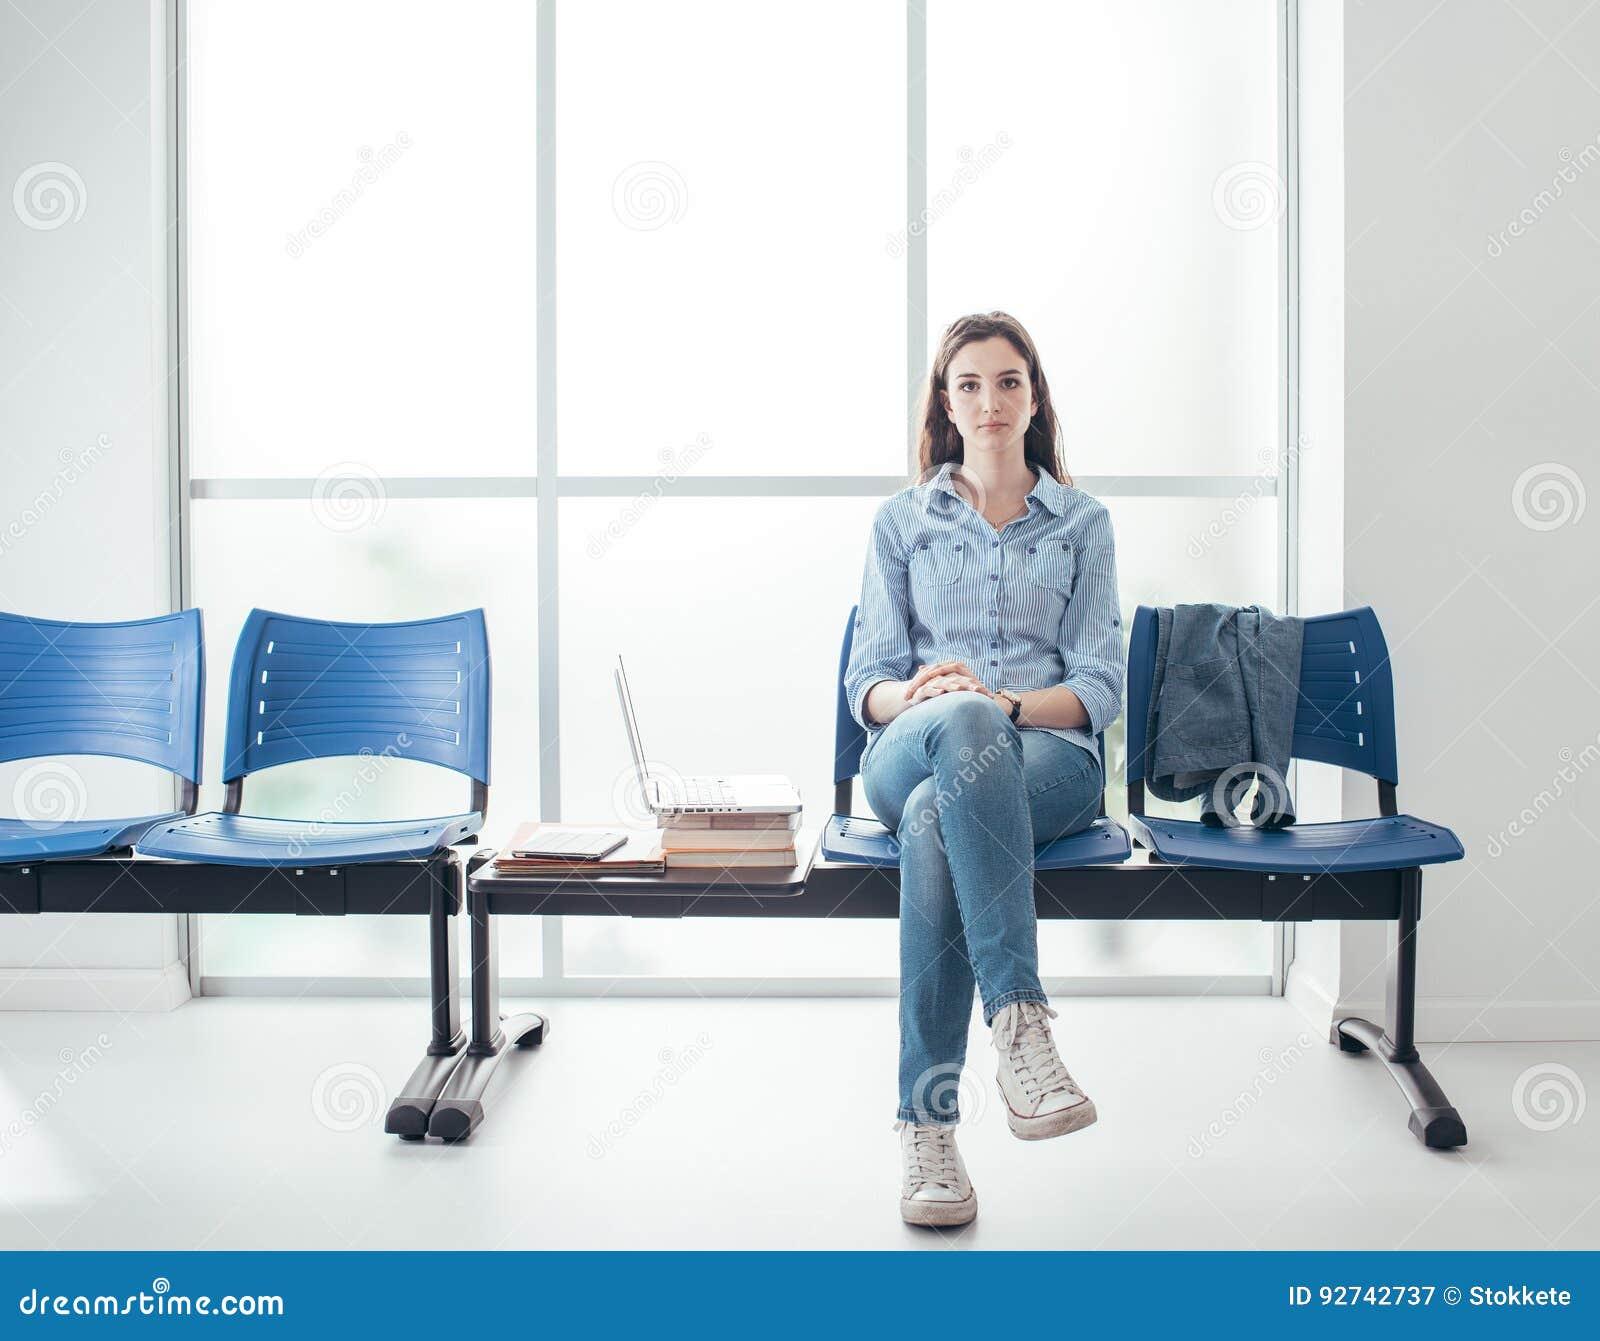 Estudante na sala de espera